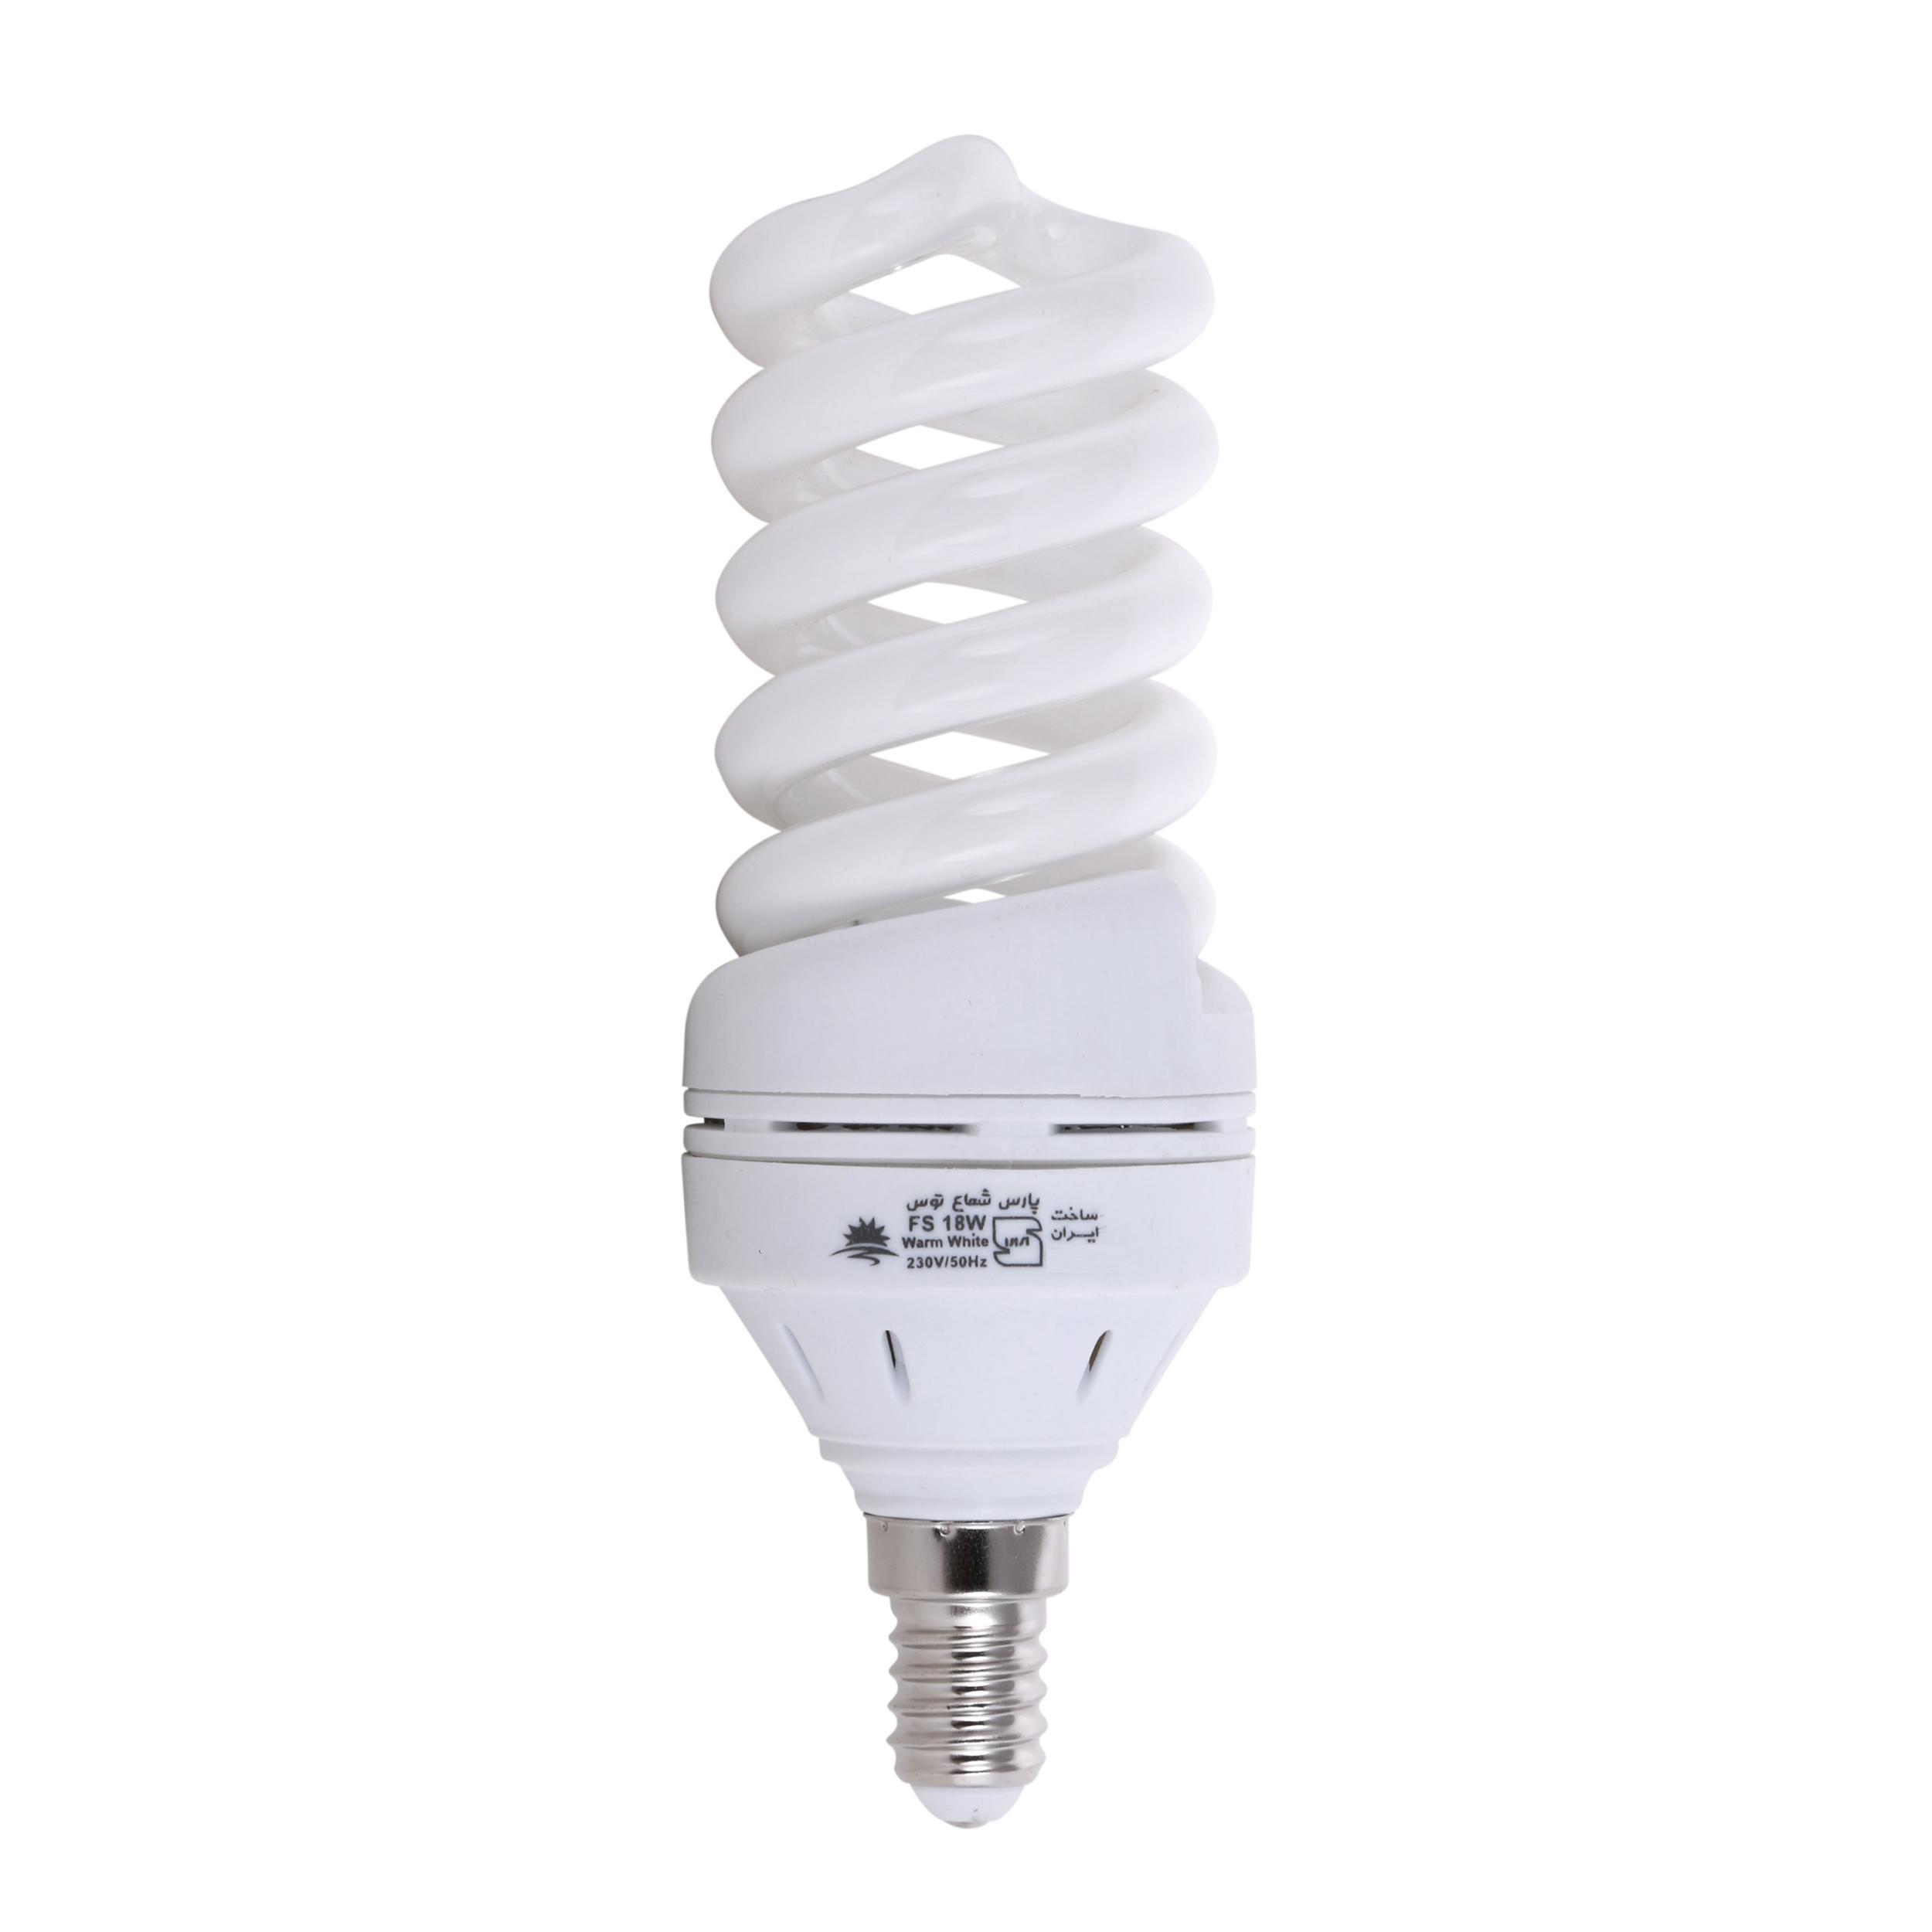 لامپ کم مصرف 18 وات پارس شعاع توس مدل FS18 پایه E14